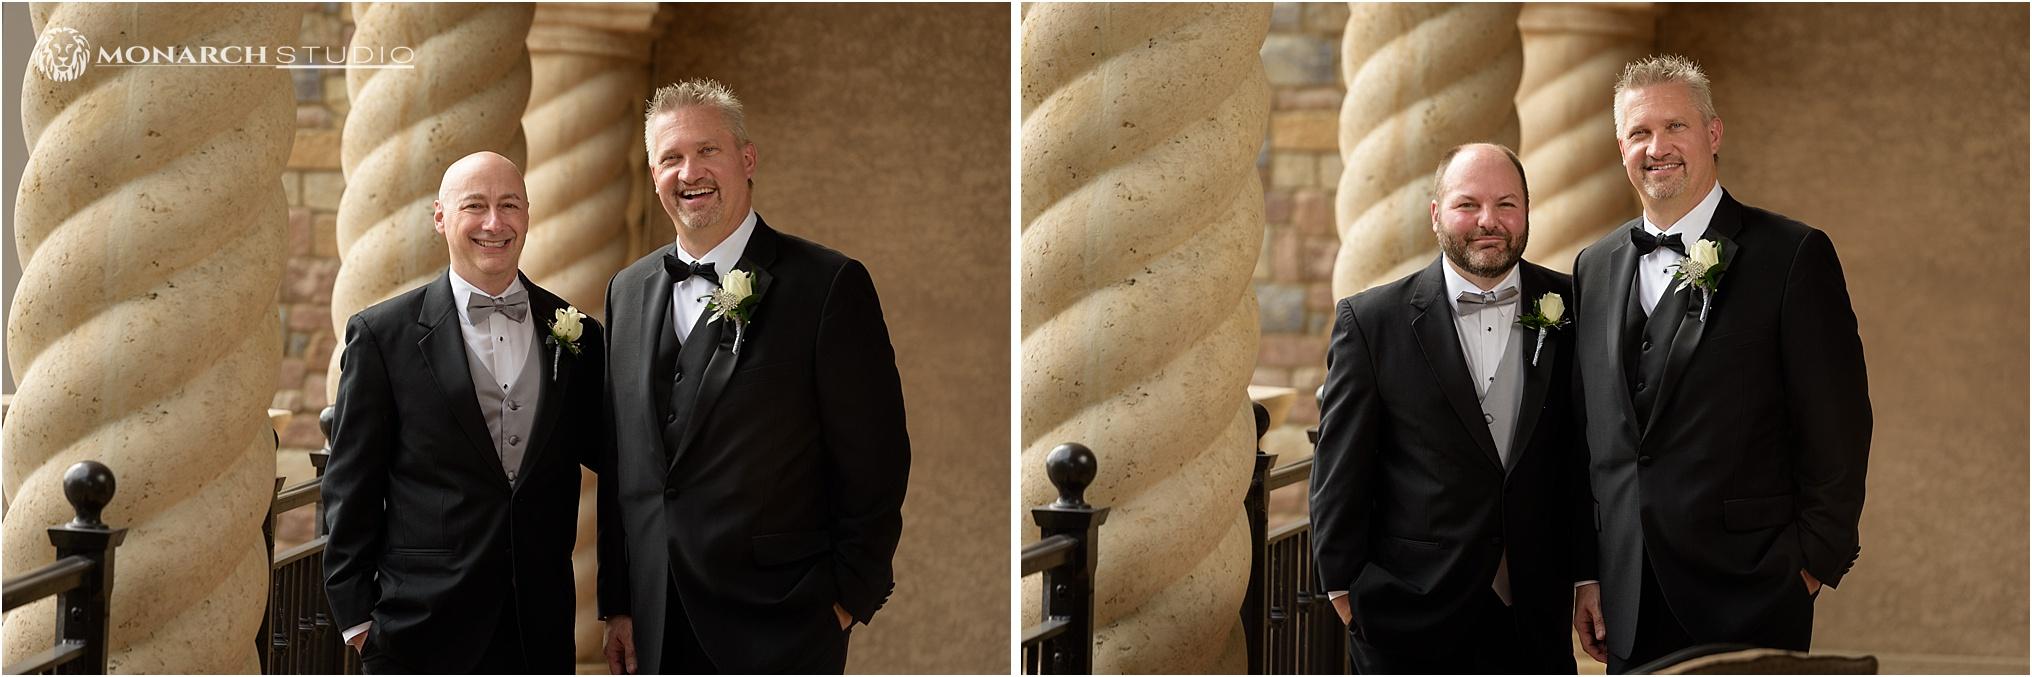 ponte-vedra-wedding-photographer-tpc006.jpg